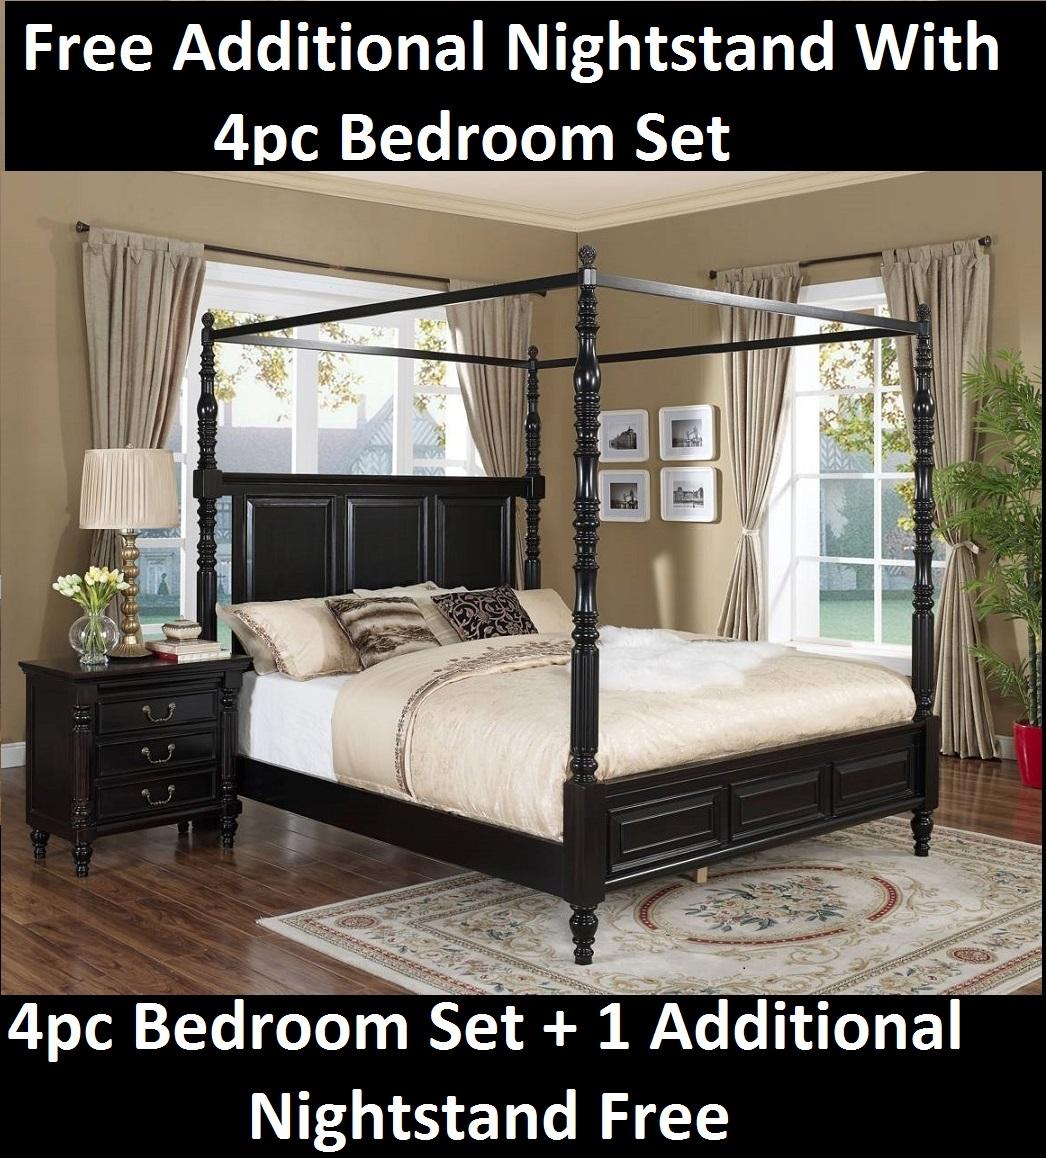 Nightstand Free W 4pc Western King Size Bedroom Hardwood